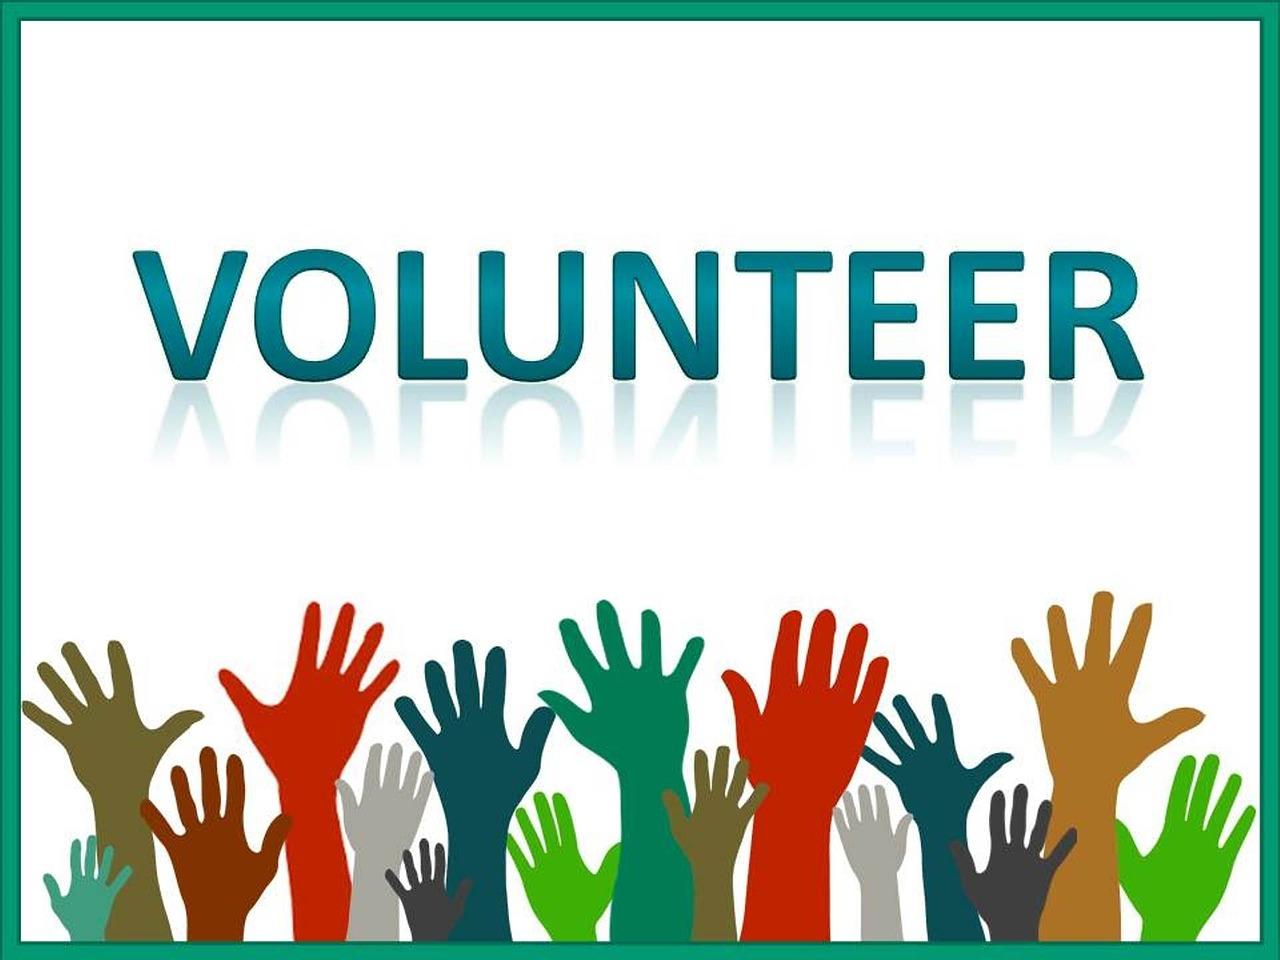 https://www.safecommunitiesportugal.com/wp-content/uploads/2021/01/volunteer-652383_1280.jpg